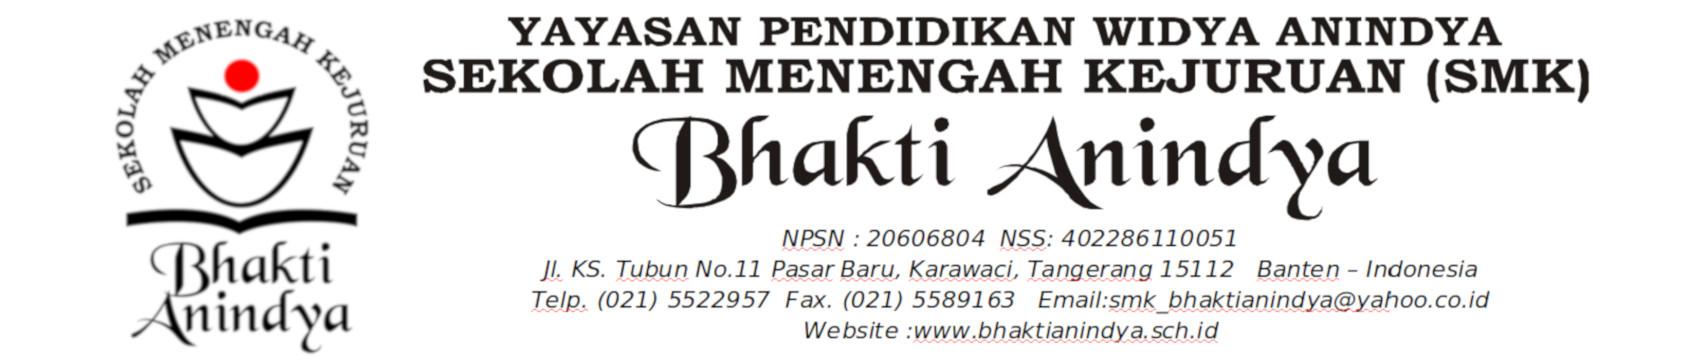 Surat Kelulusan Siswa Smk Bhakti Anindya